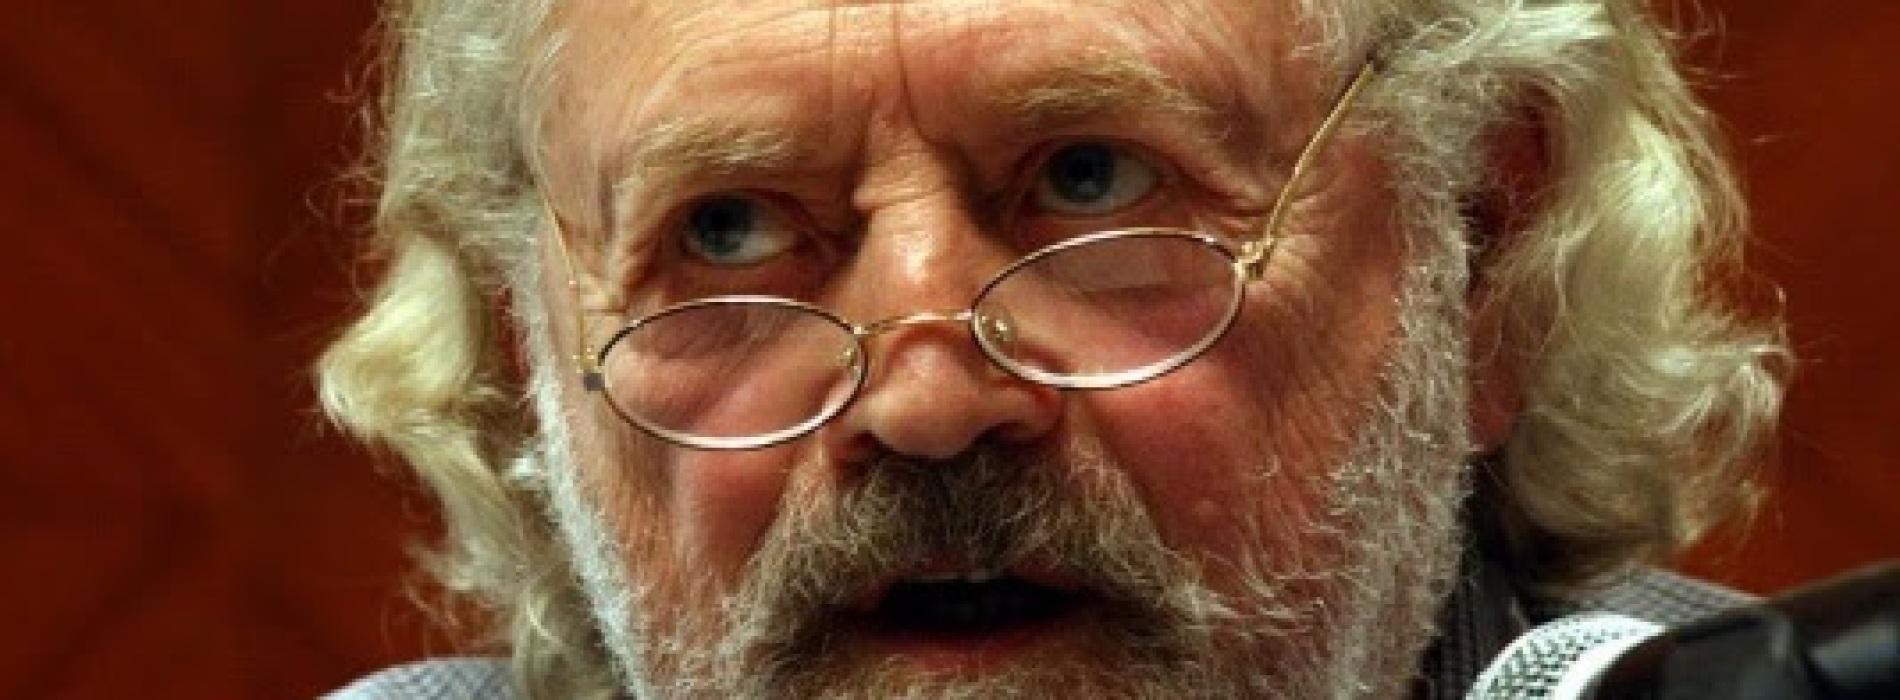 Paul Polansky a Marcianise, il poeta Usa è voce dei senza voce